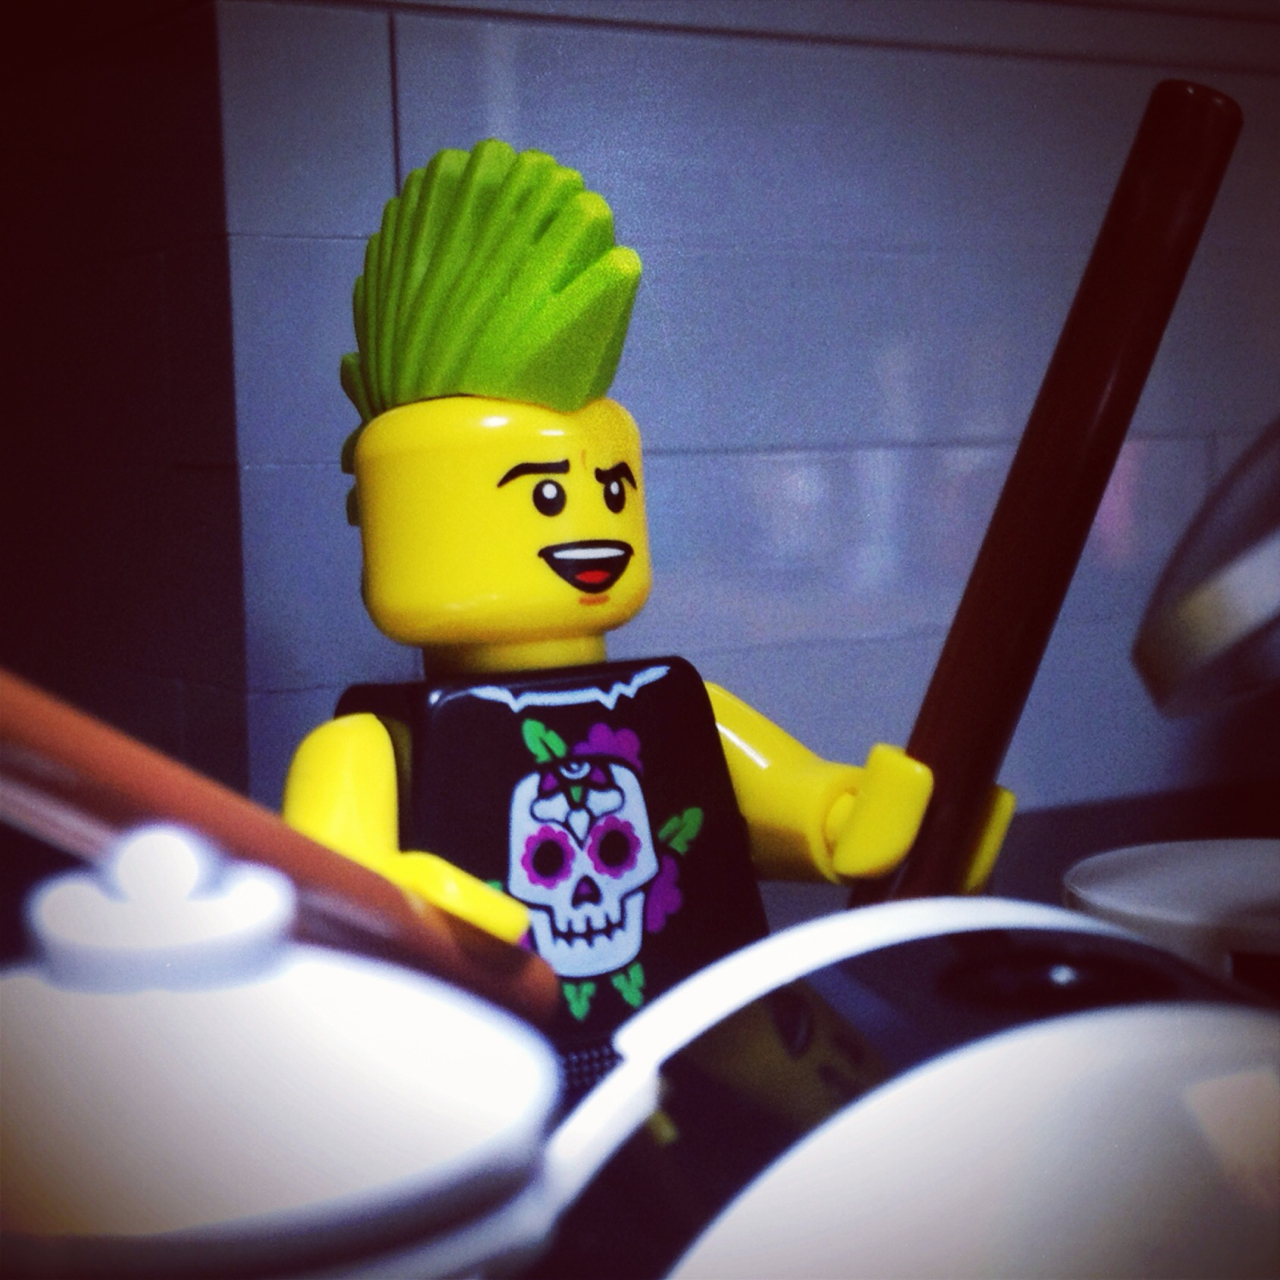 LegoGenre 00211: Duh Duh Dah… Duh Duh Dah, Dah Du Dah Dah Du Dah…